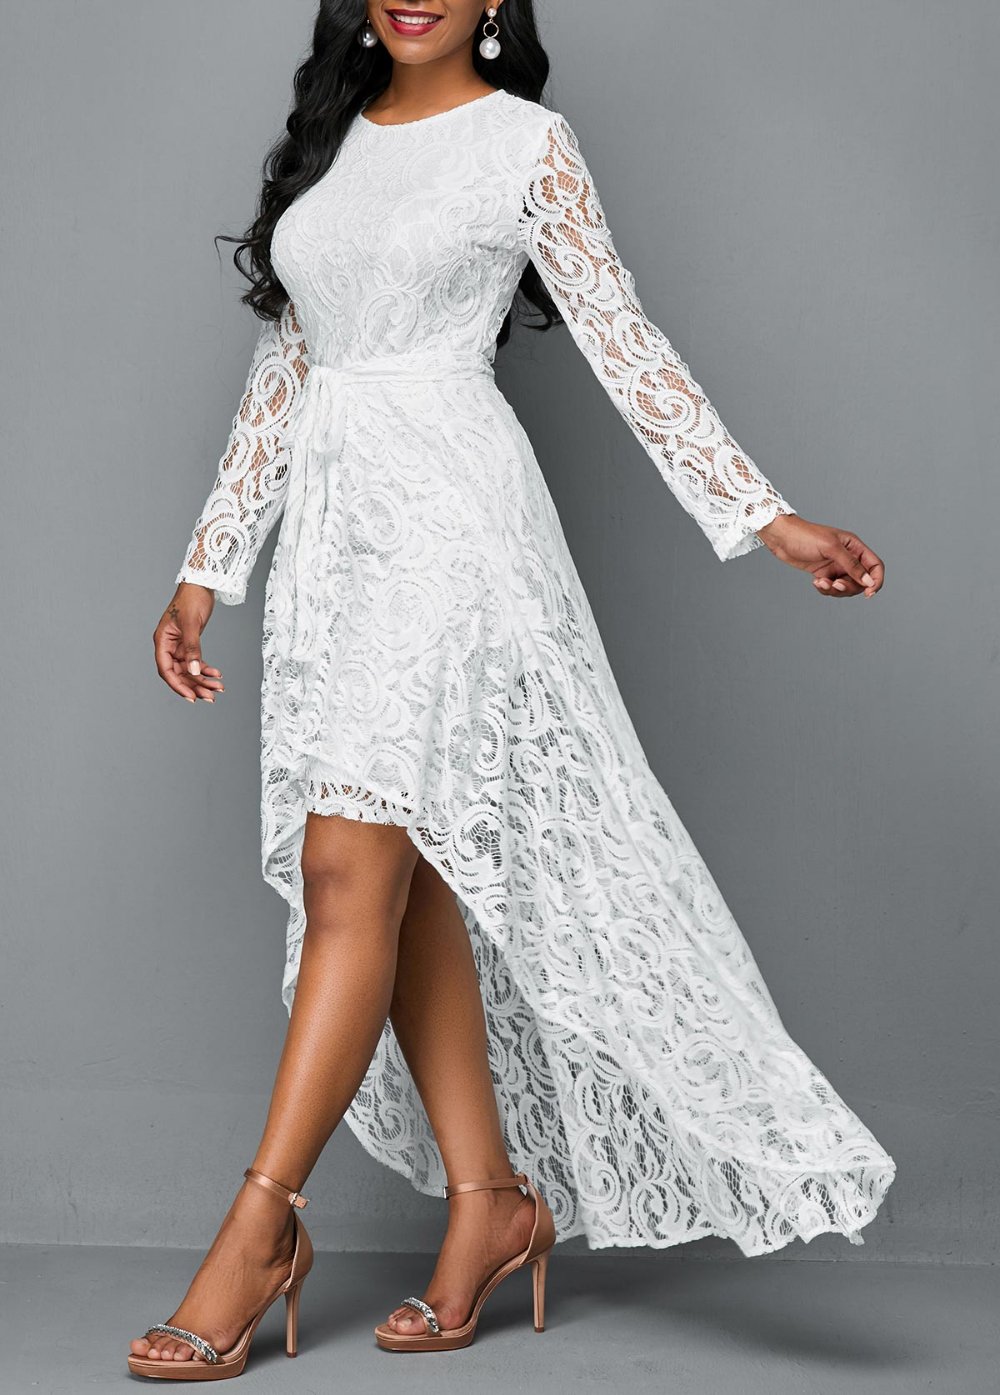 Long Sleeve Lace Dress And High Low Skirt Rosewe Com Usd 37 34 Vestidos De Mujer Trajes De Fiesta Trajes [ 1395 x 1000 Pixel ]